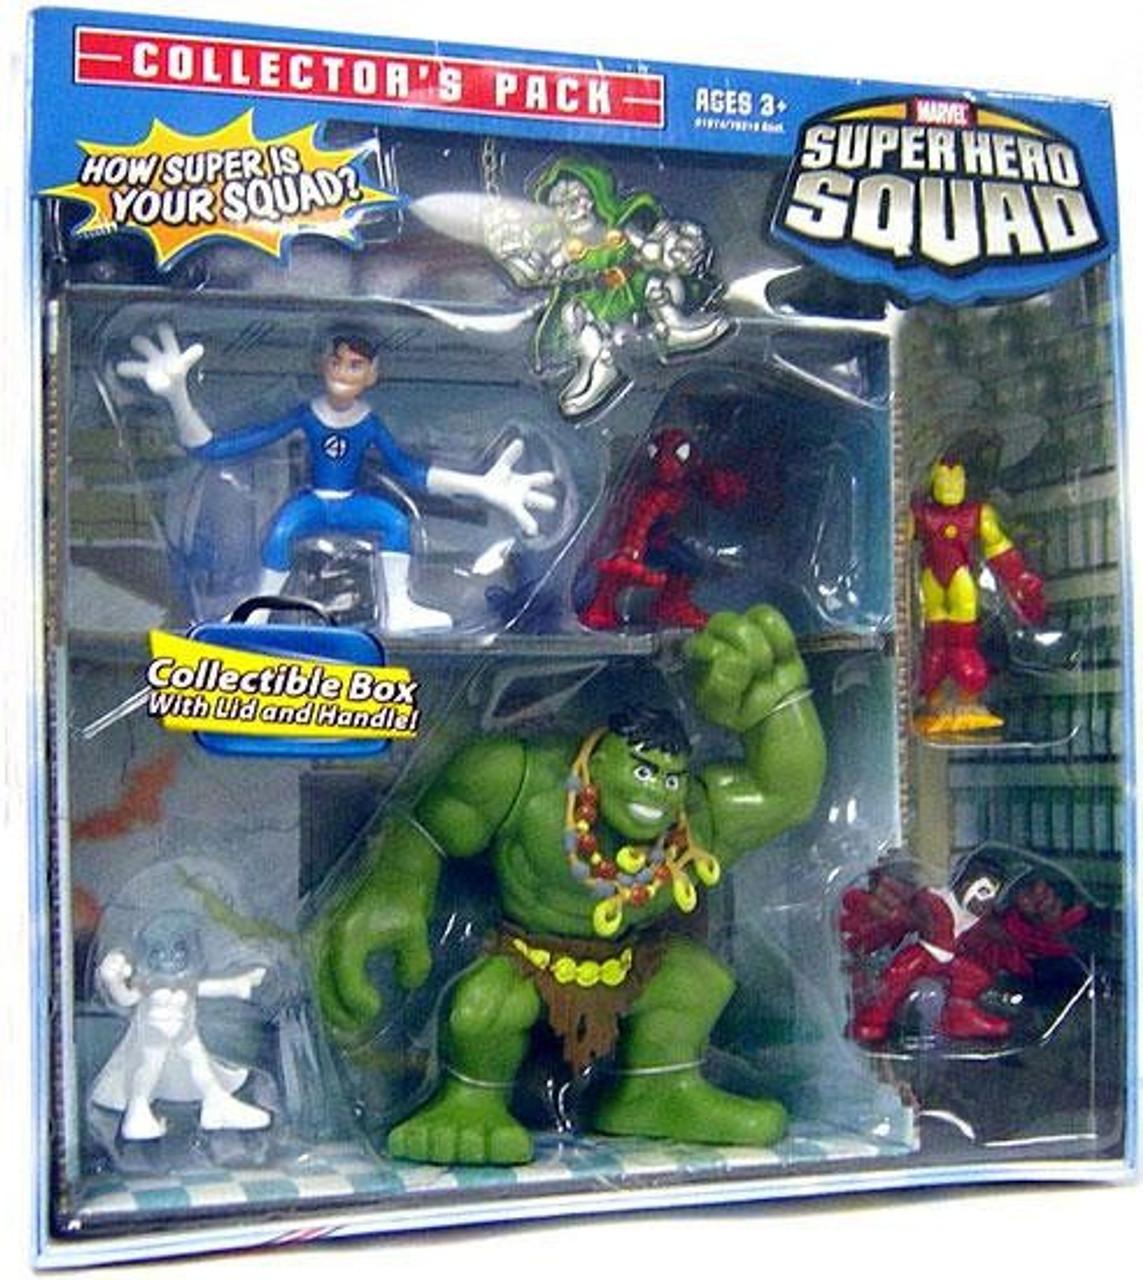 Marvel Super Hero Squad Collector's Pack Exclusive Action Figure Set [Hulk]